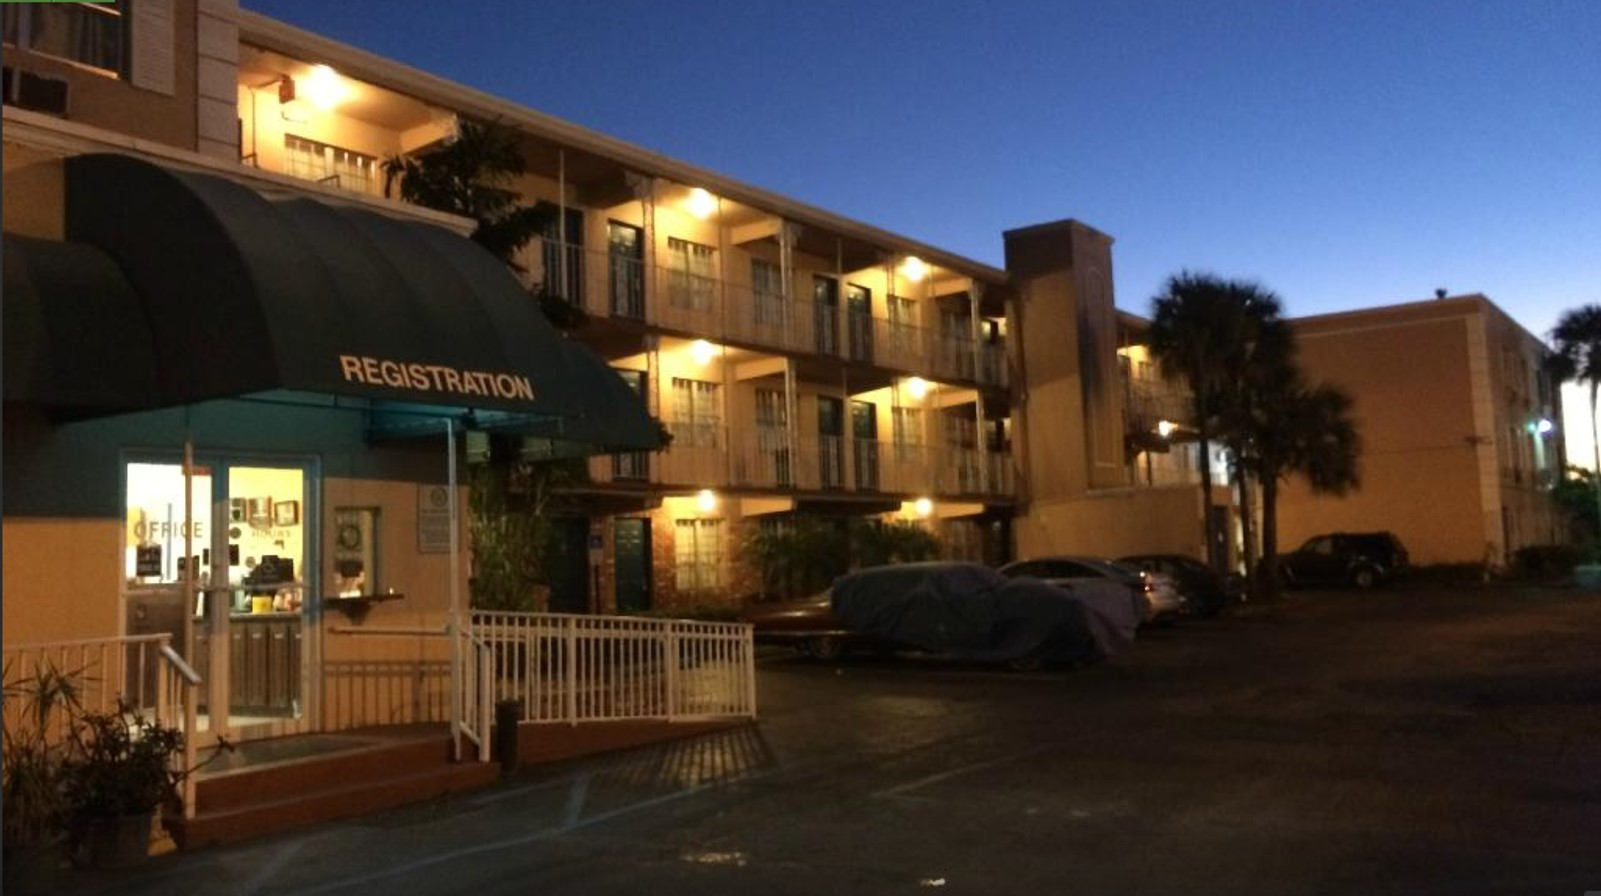 EXECUTIVE ECONOMY LODGE | Pompano Beach, FL 33062